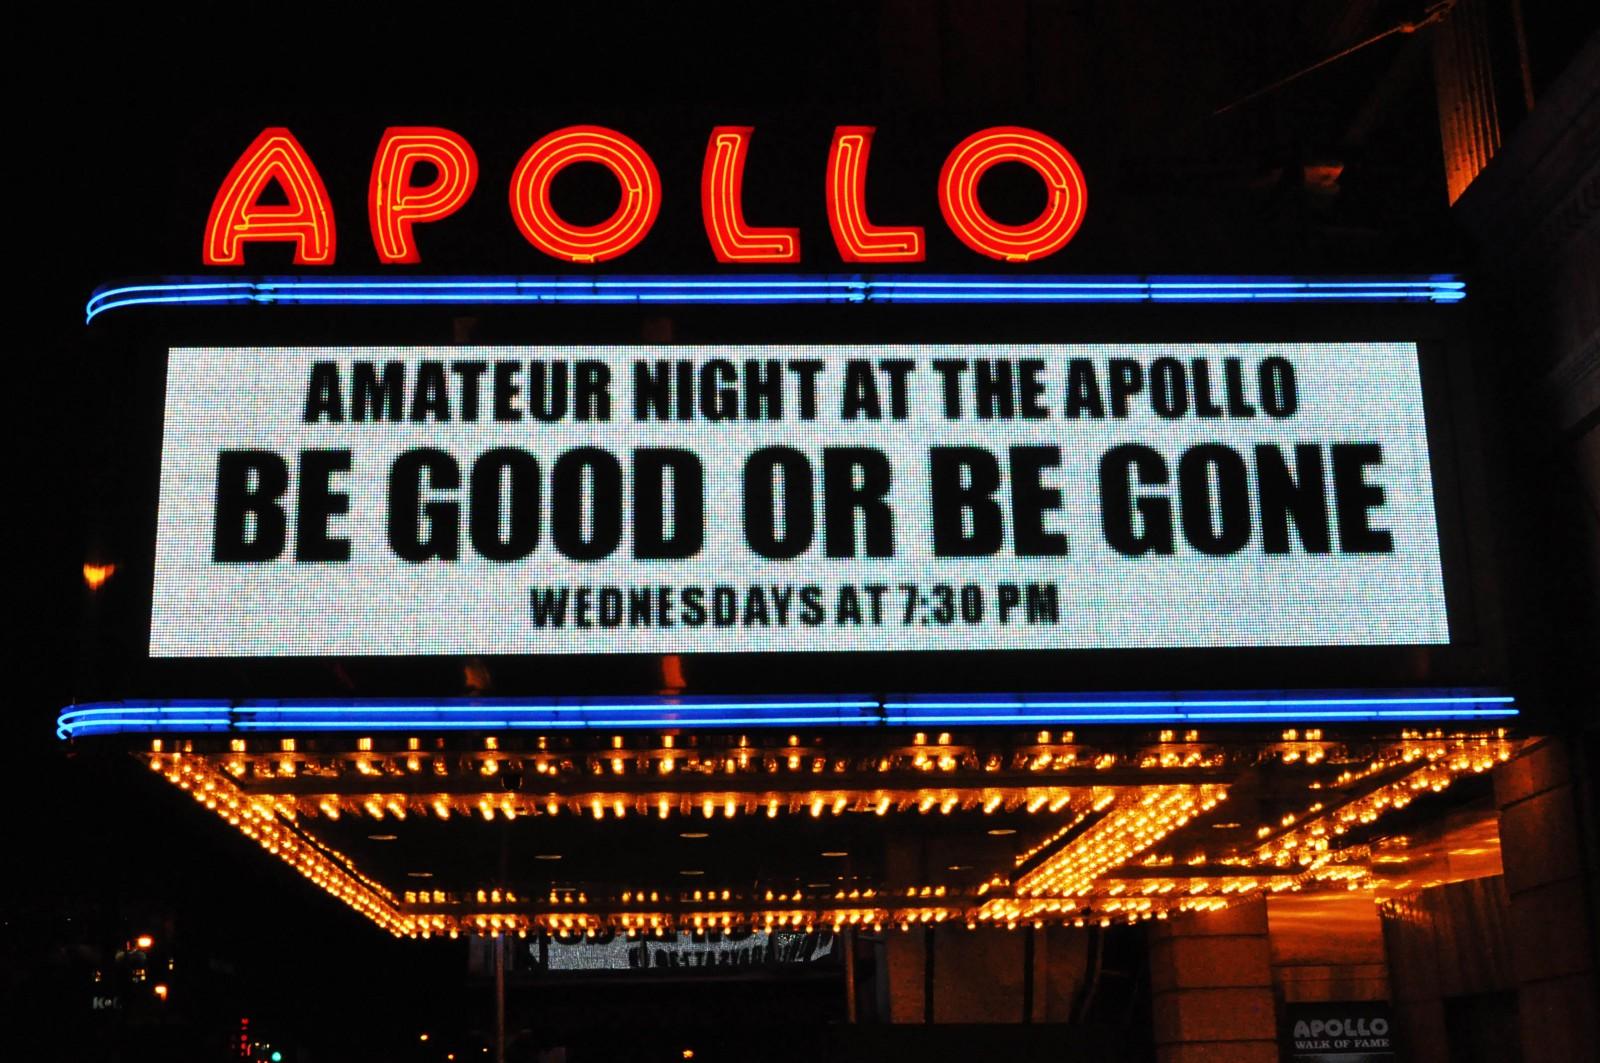 Amateur night at the apollo theatre